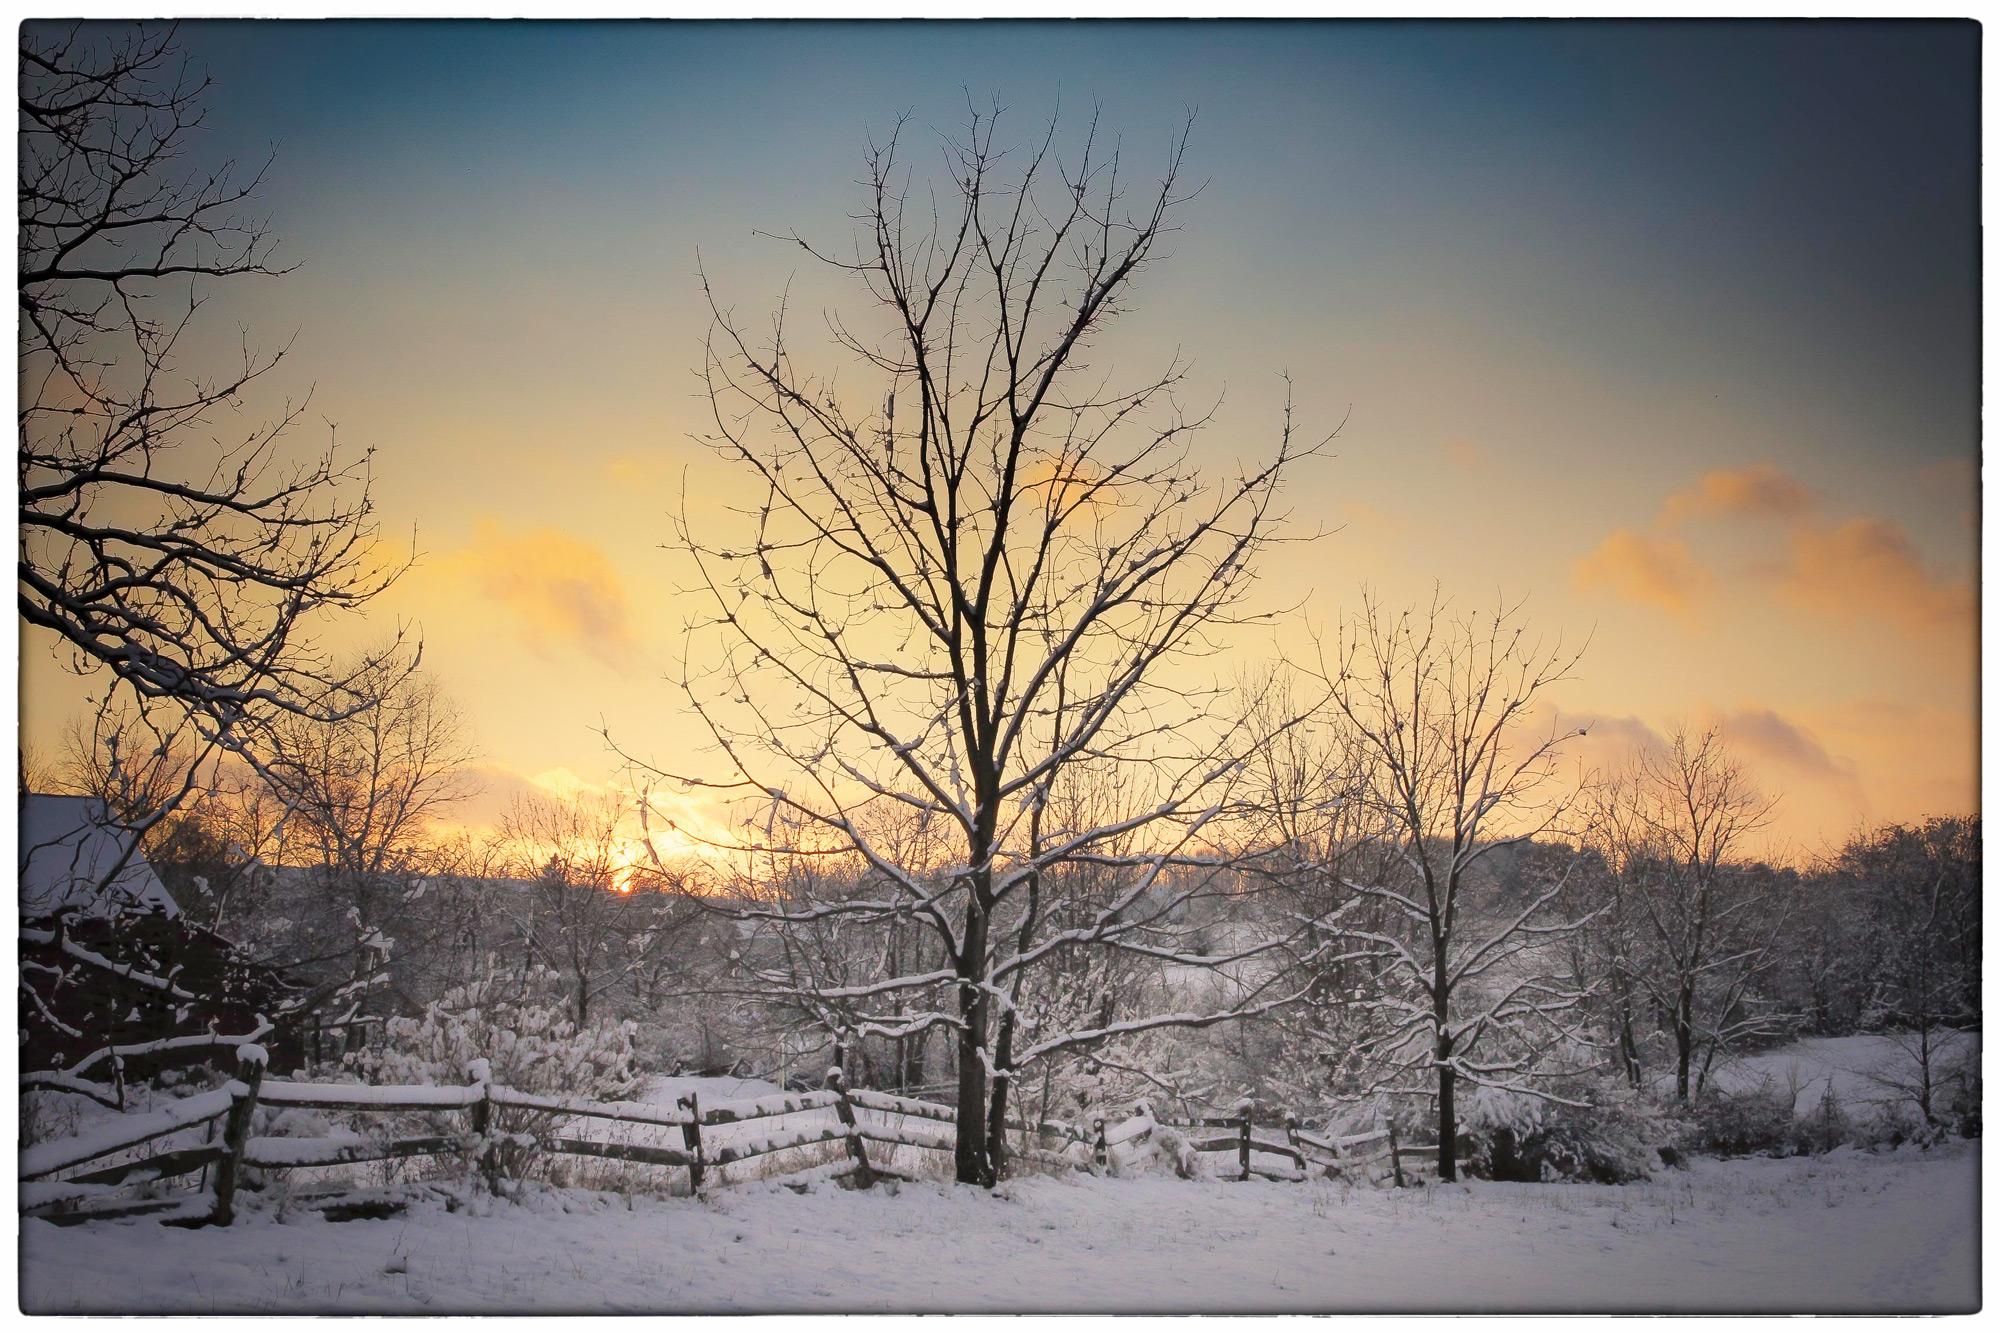 Snowy-Oldwick-1.jpg